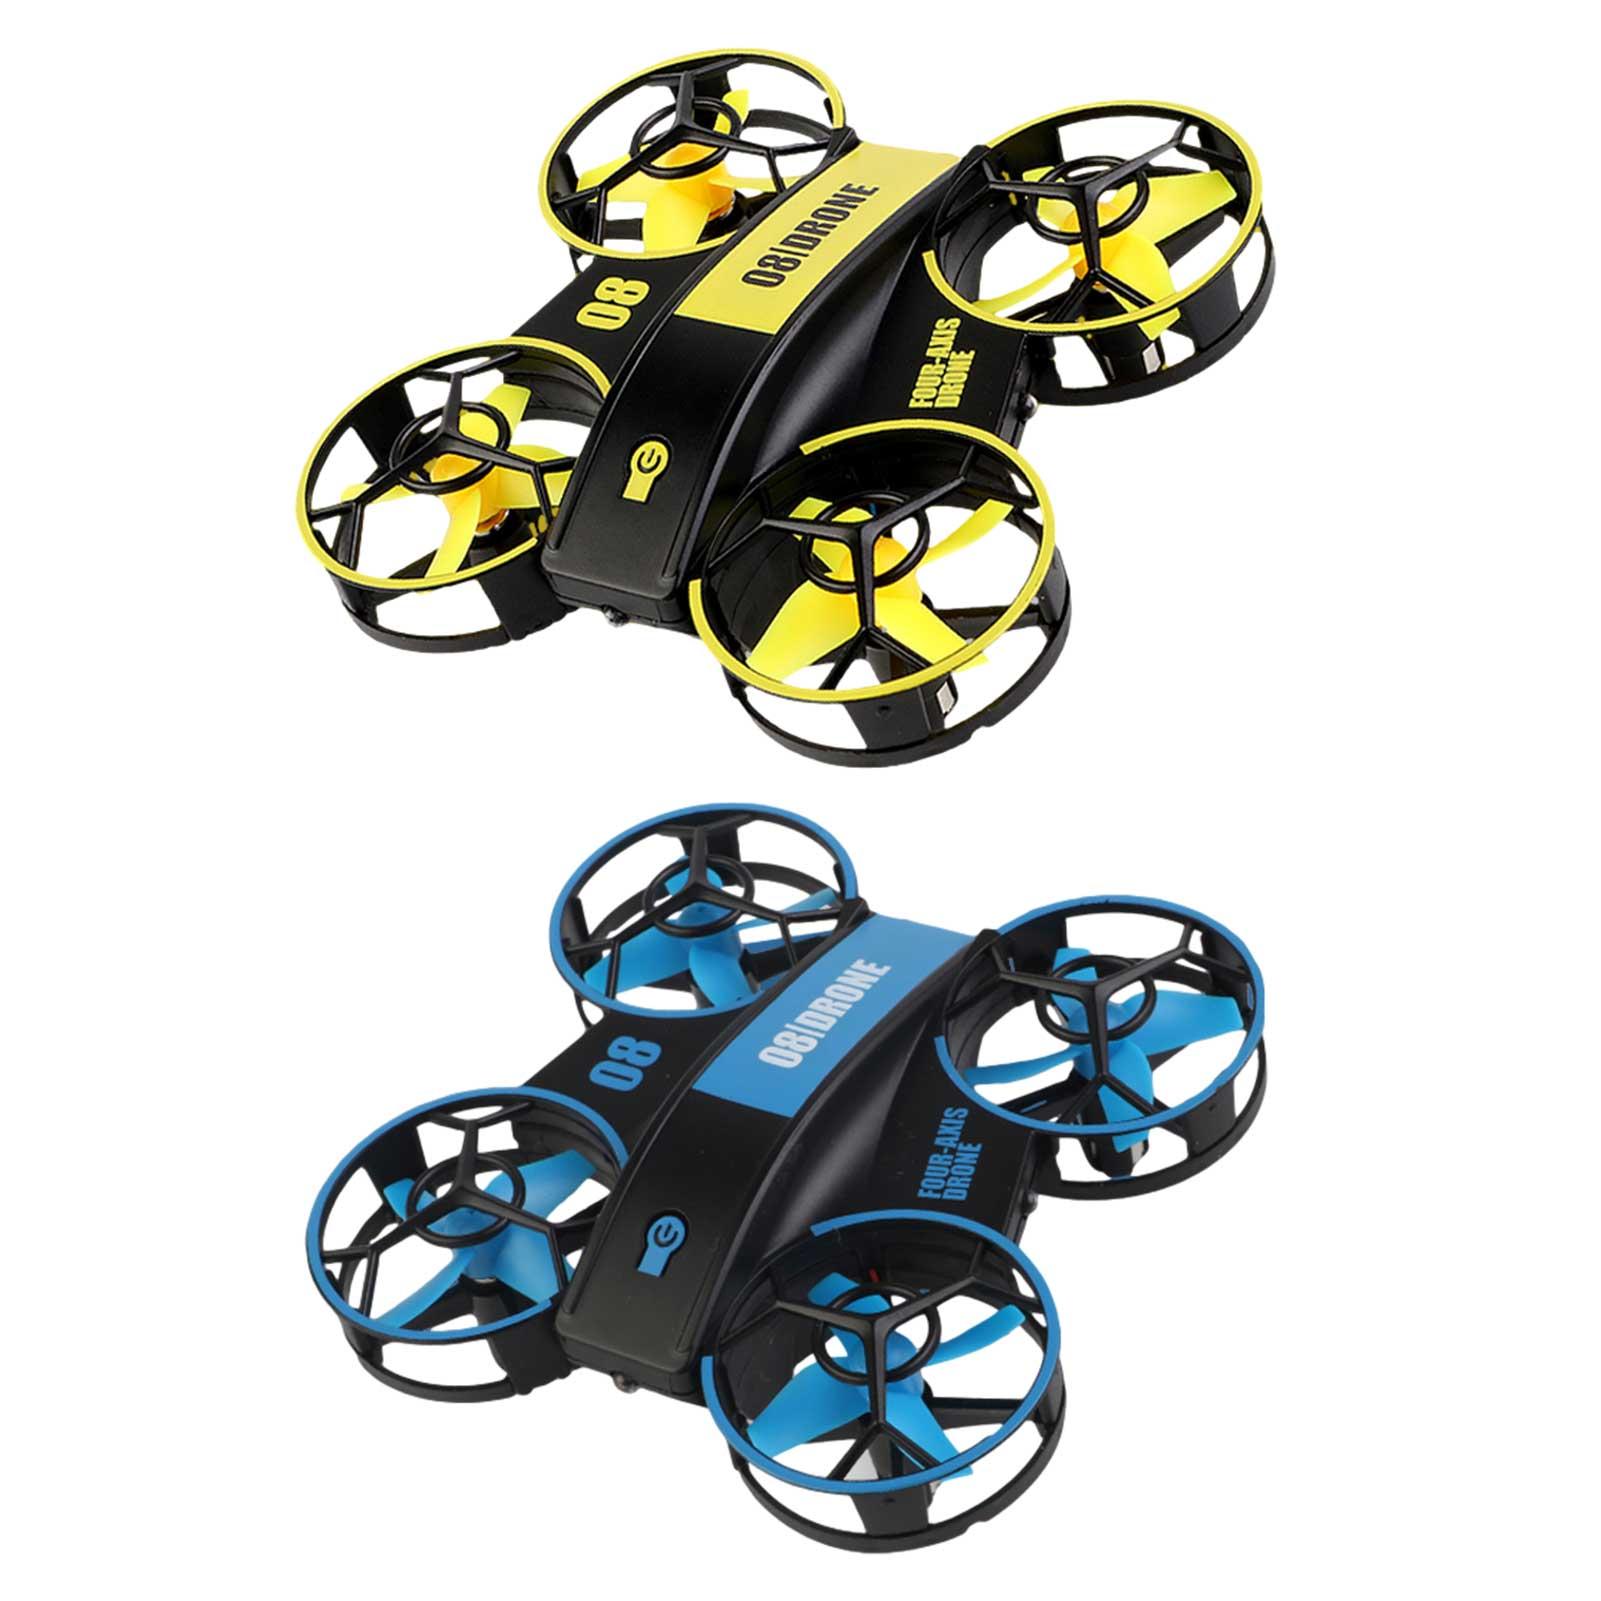 360 Degrees Quadcopter Mini Remote Control Drone Dron Aircraft RC Quadcopter Toys For Children Mini Drone Beginners